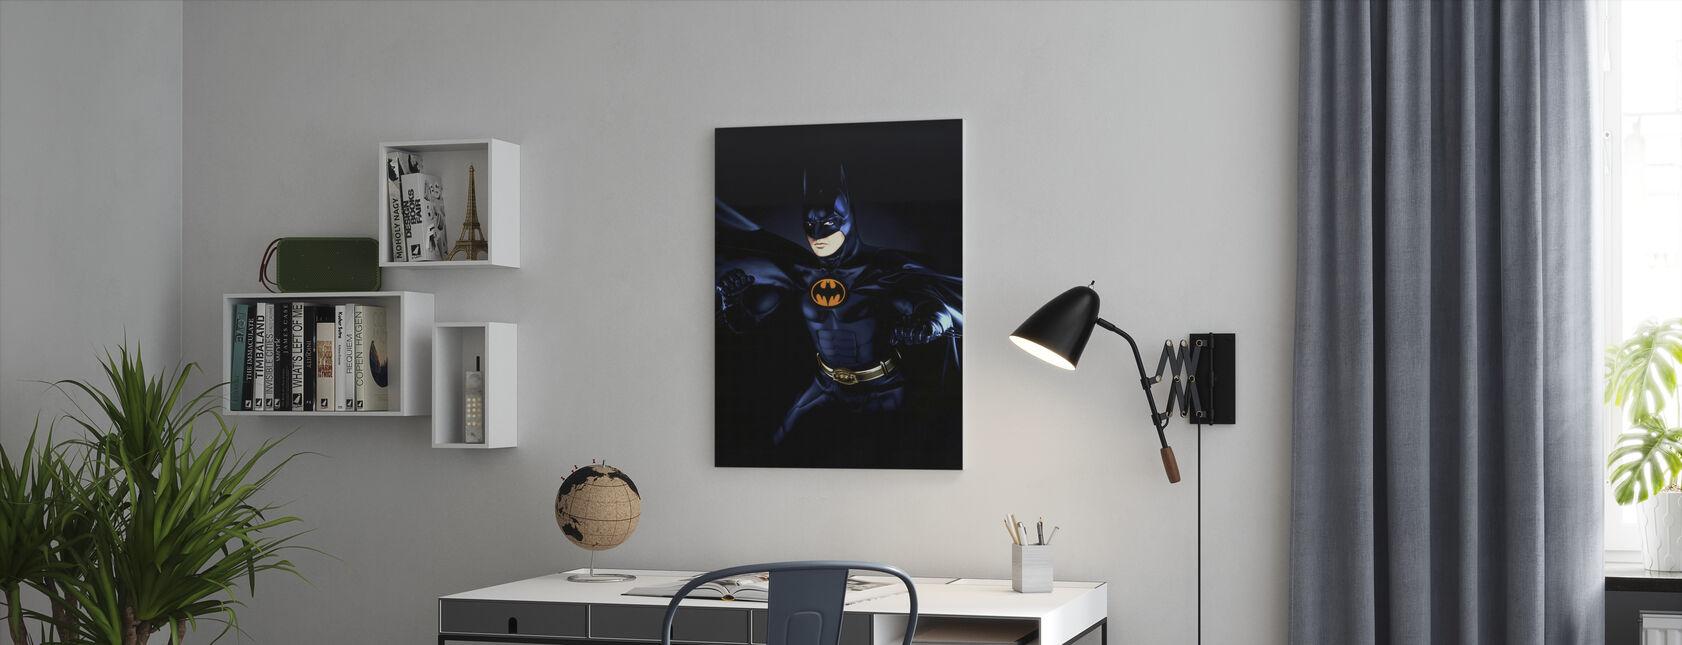 Michael Keaton in Batman Returns - Canvas print - Kantoor